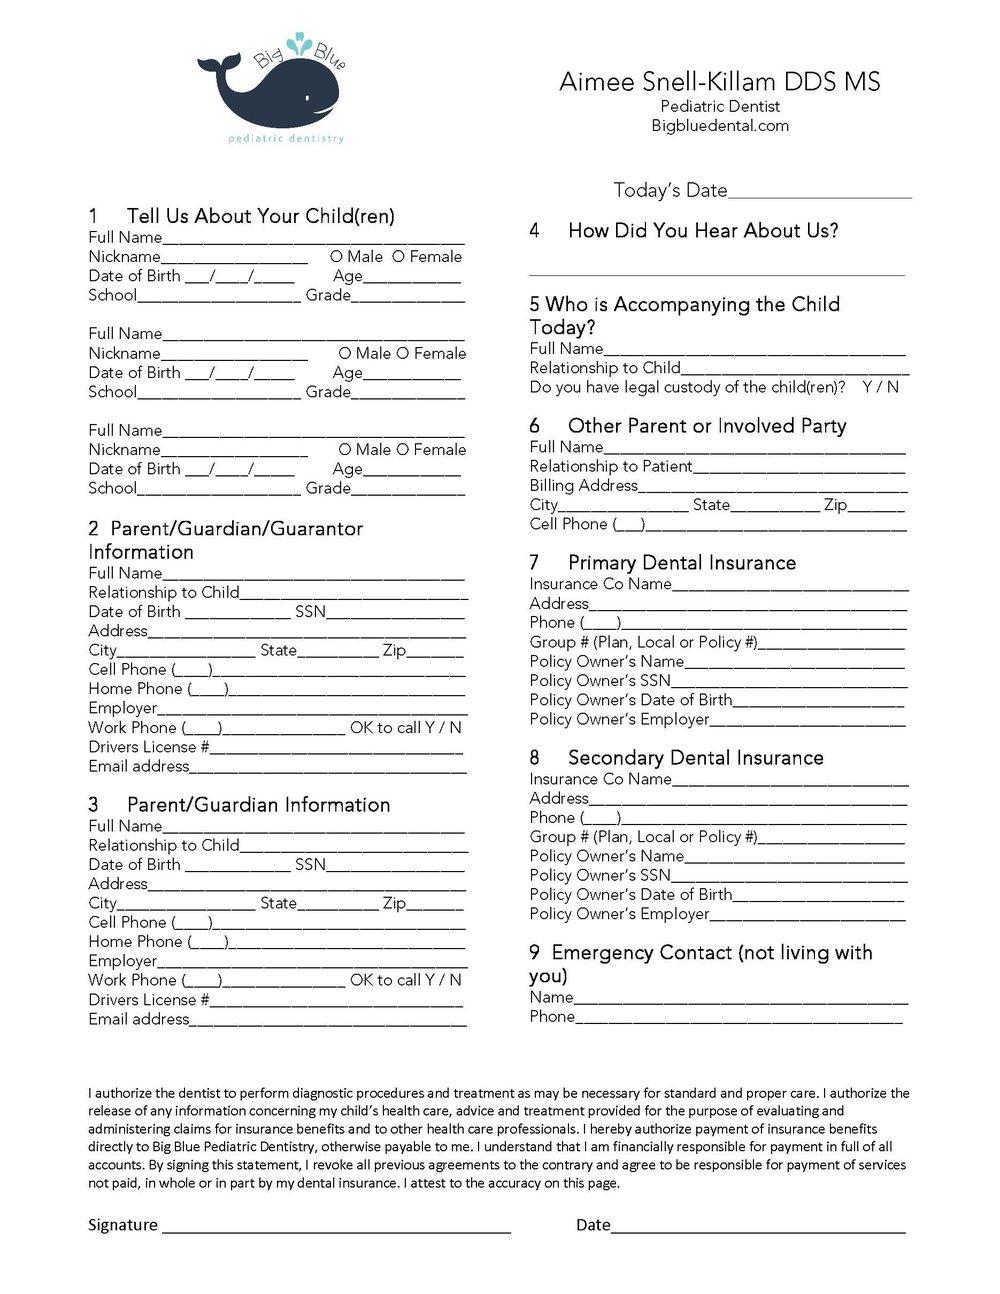 Patient Information Sheet.jpg